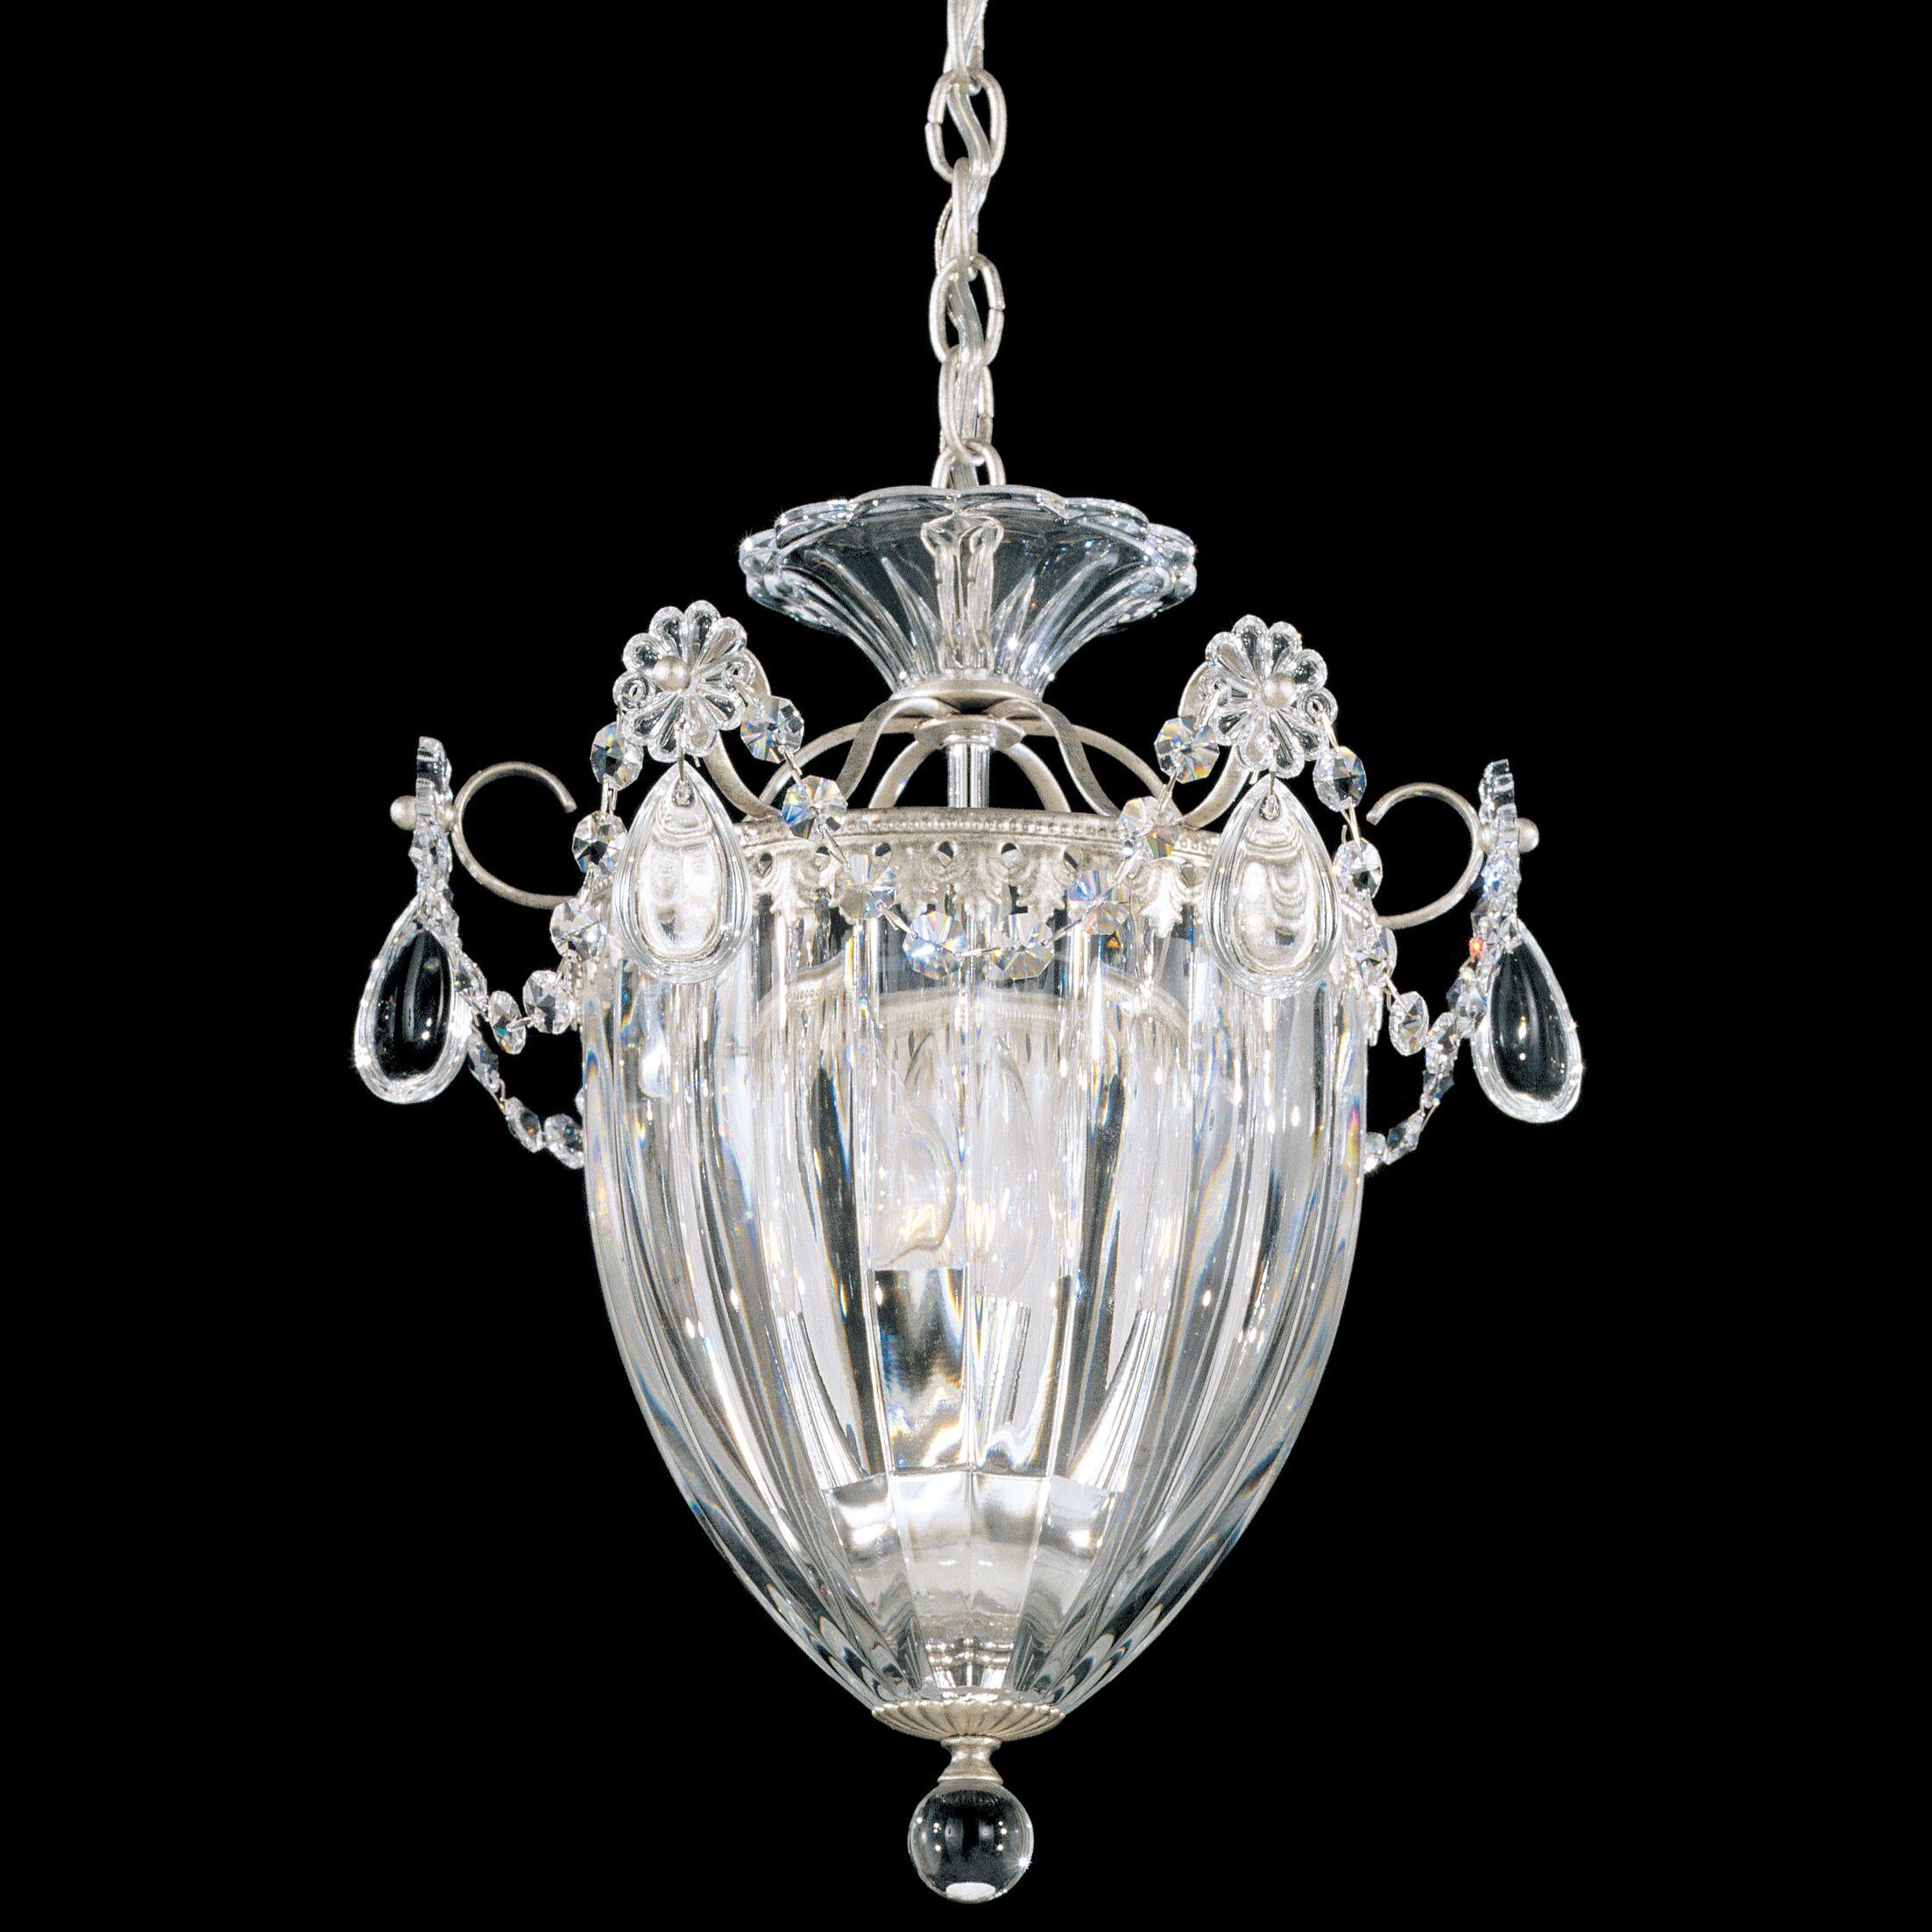 Bagatelle 3-Light Crystal Pendant Crystal Color: Swarovski Elements Clear, Finish: French Gold